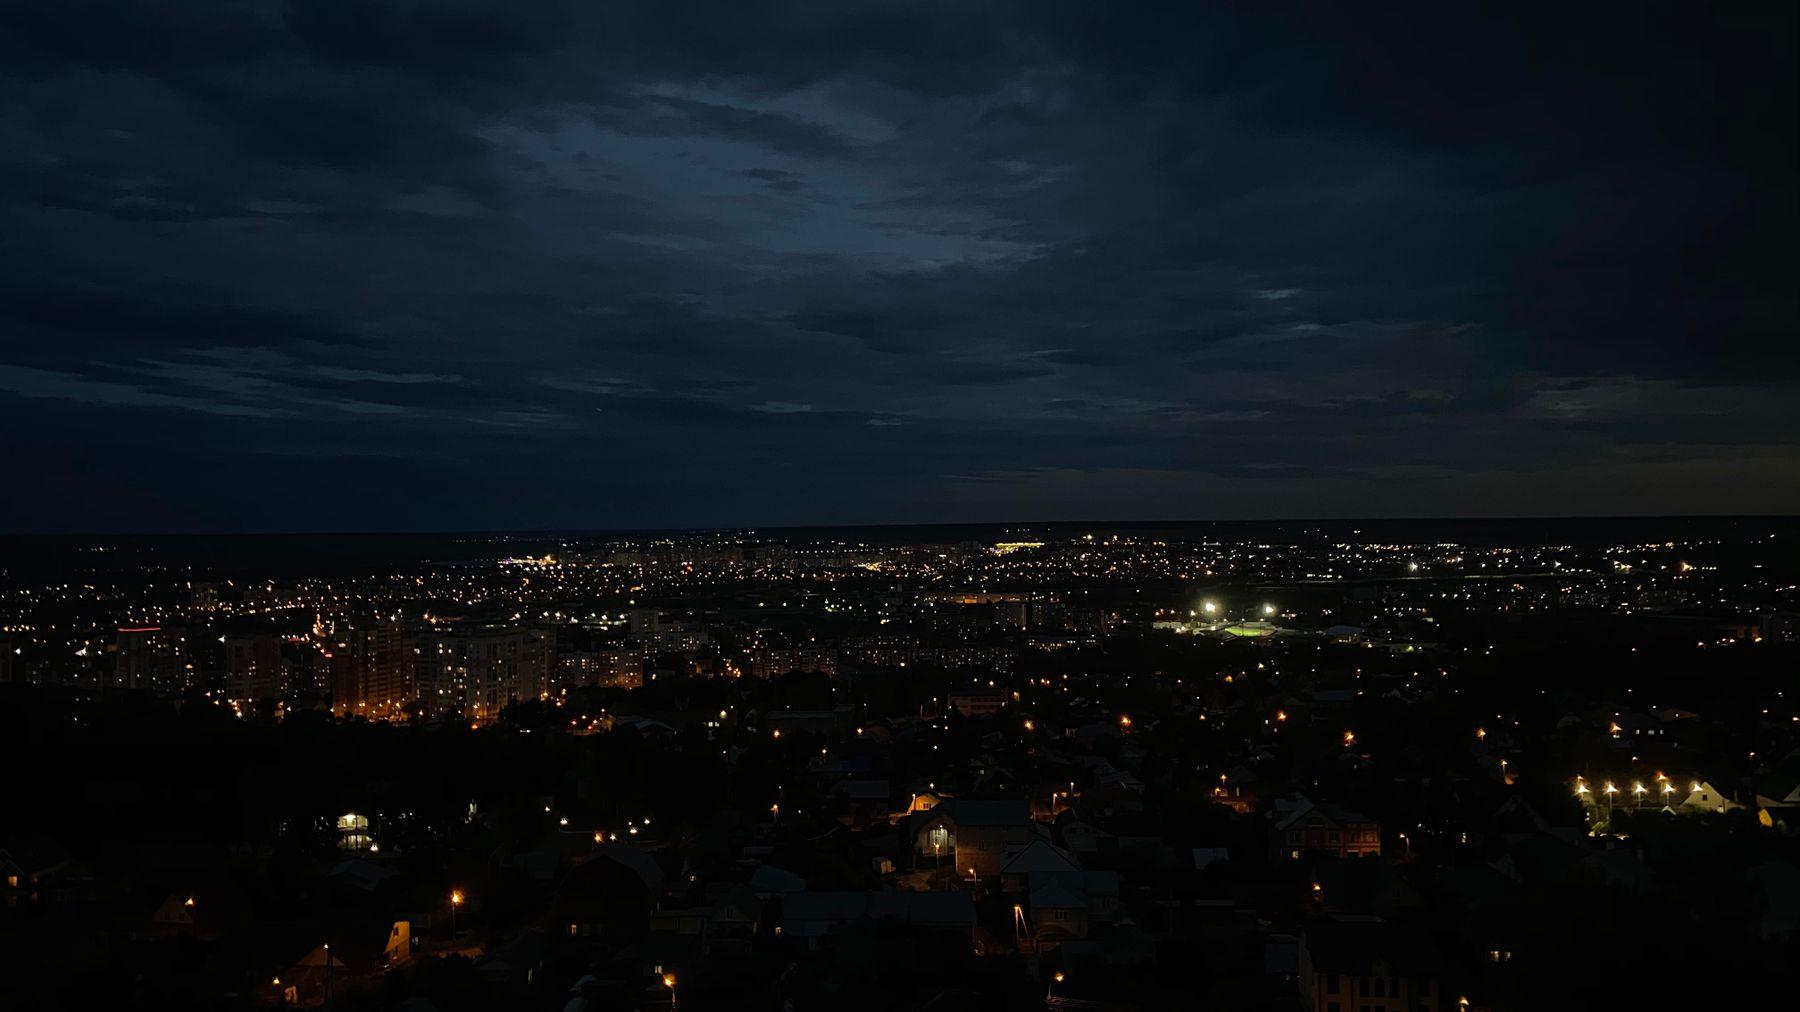 Ночное небо Penza Night time Sky